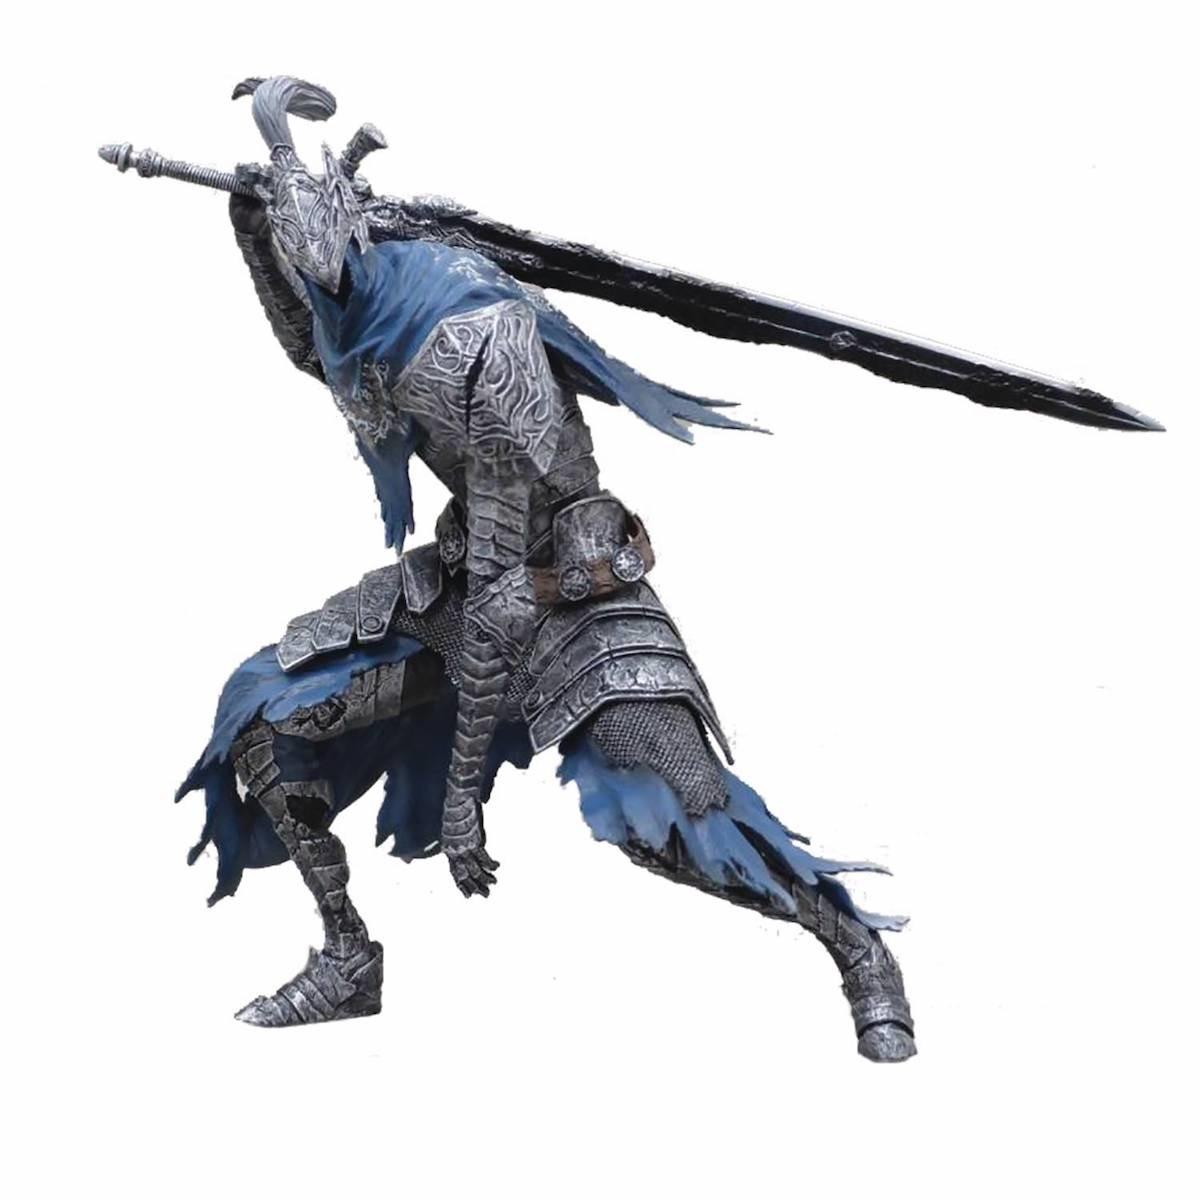 Dark Souls Dxf Sculpt Collection Vol 2 Artorias The